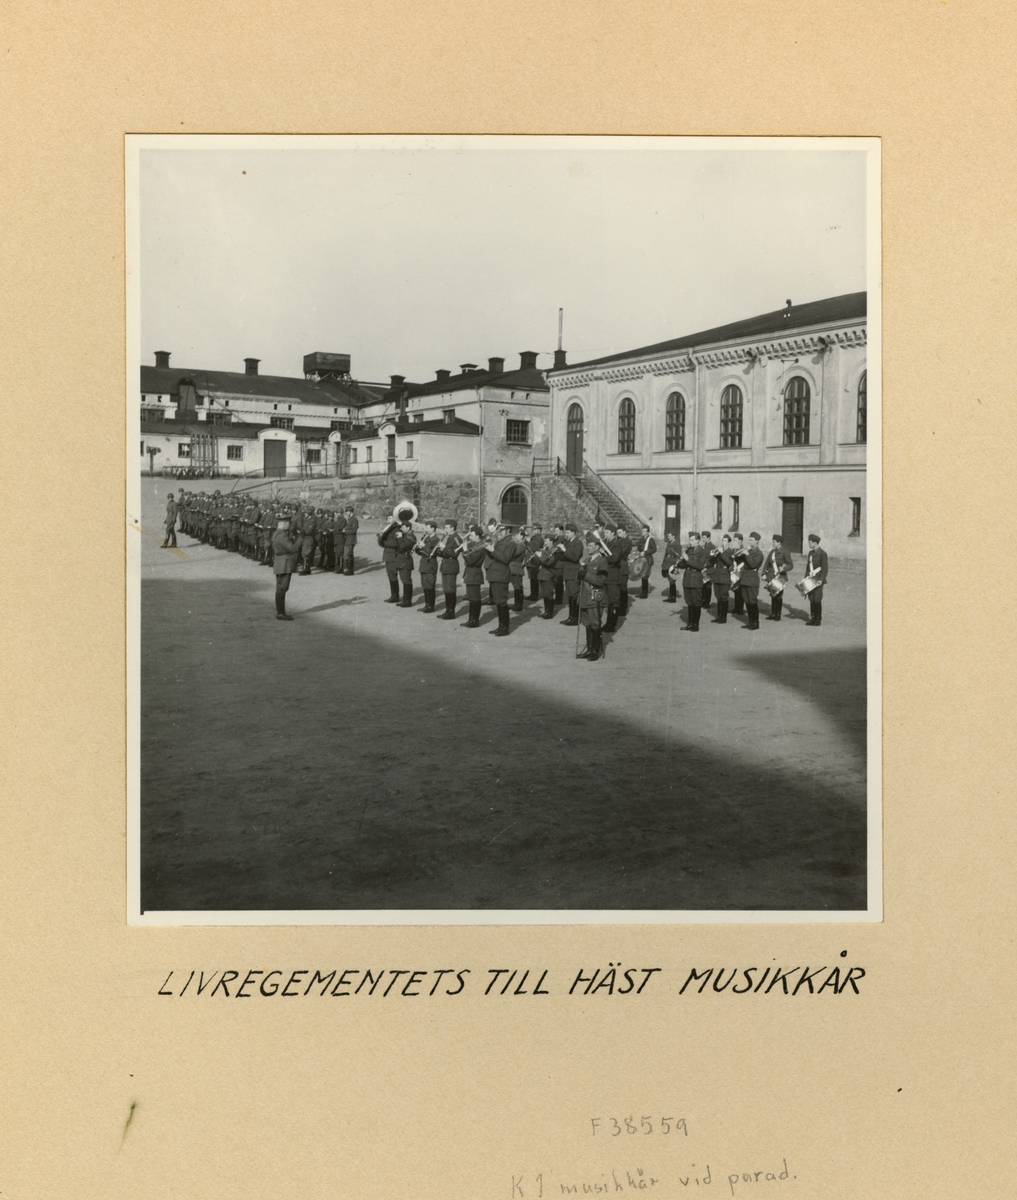 Livregementets till häst musikkår, våren 1947.